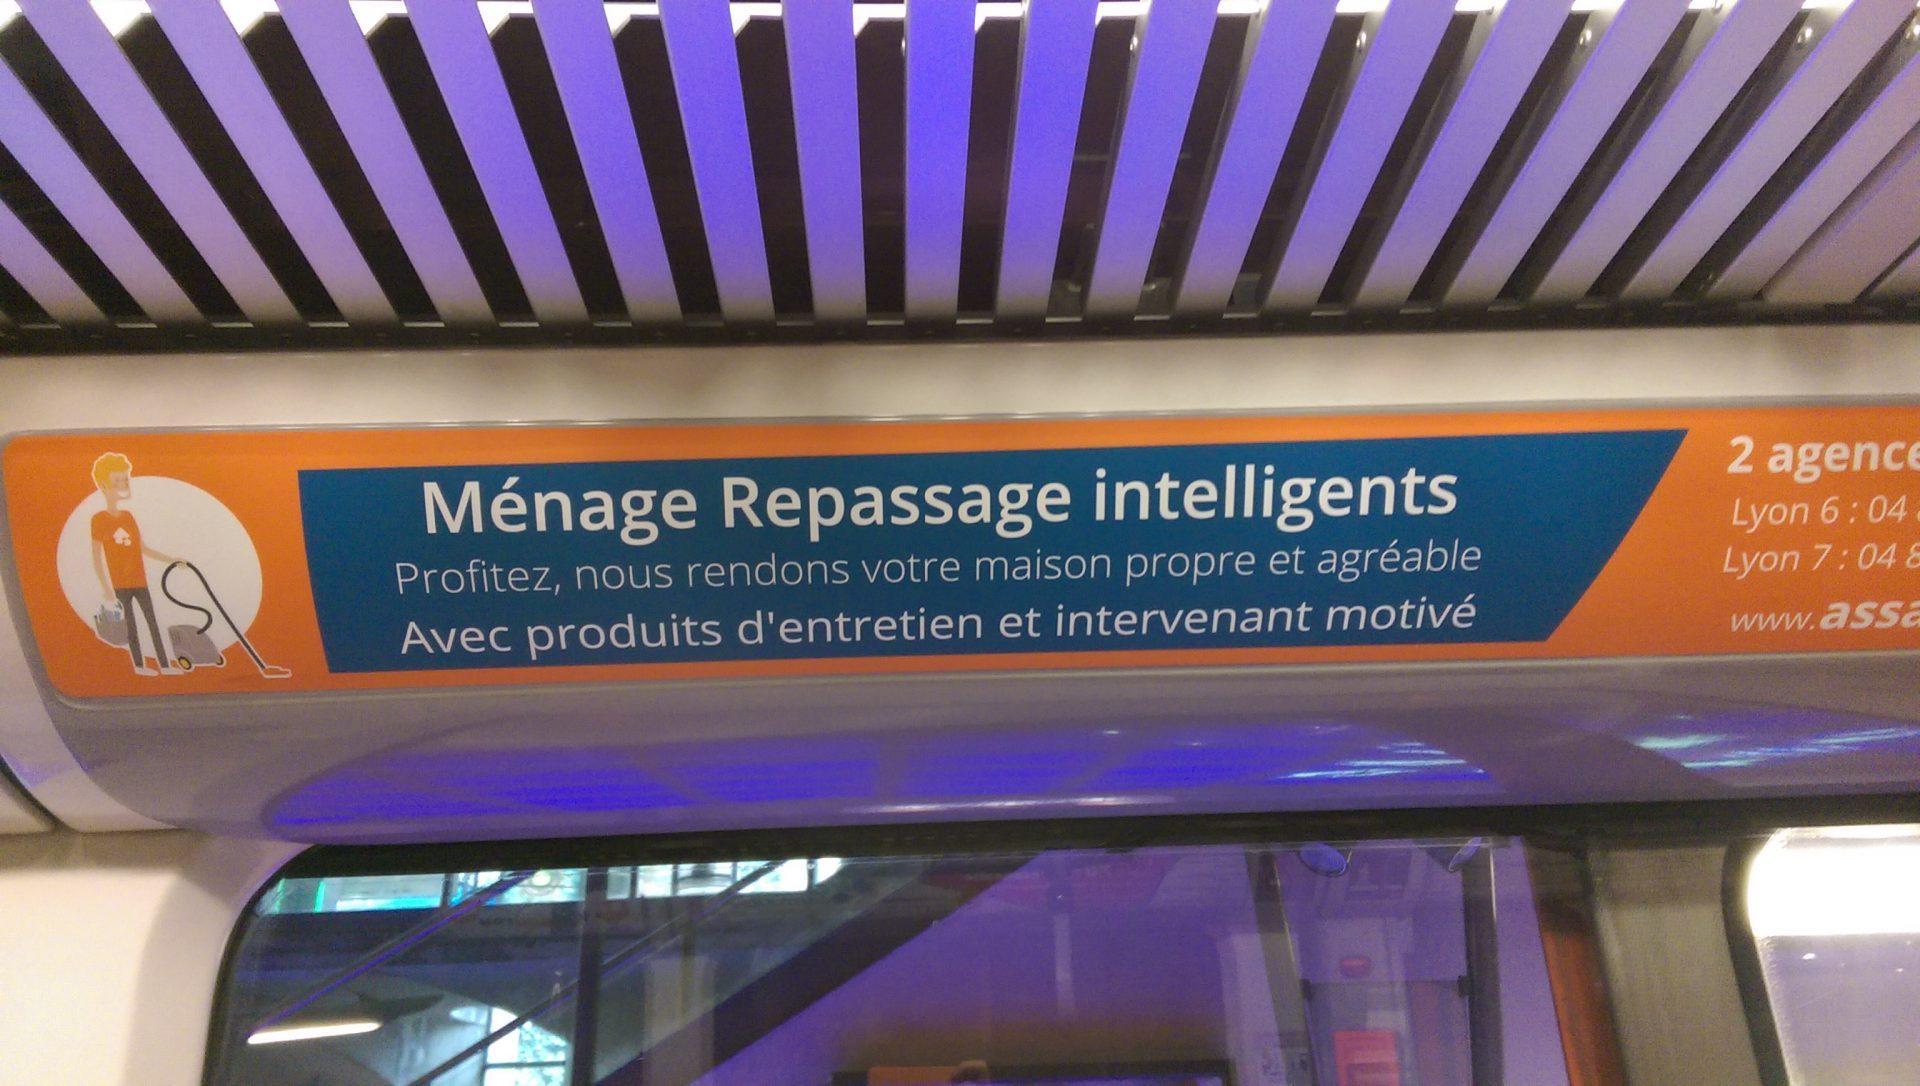 Ménage repassage intelligents - Crédit photo izart.fr